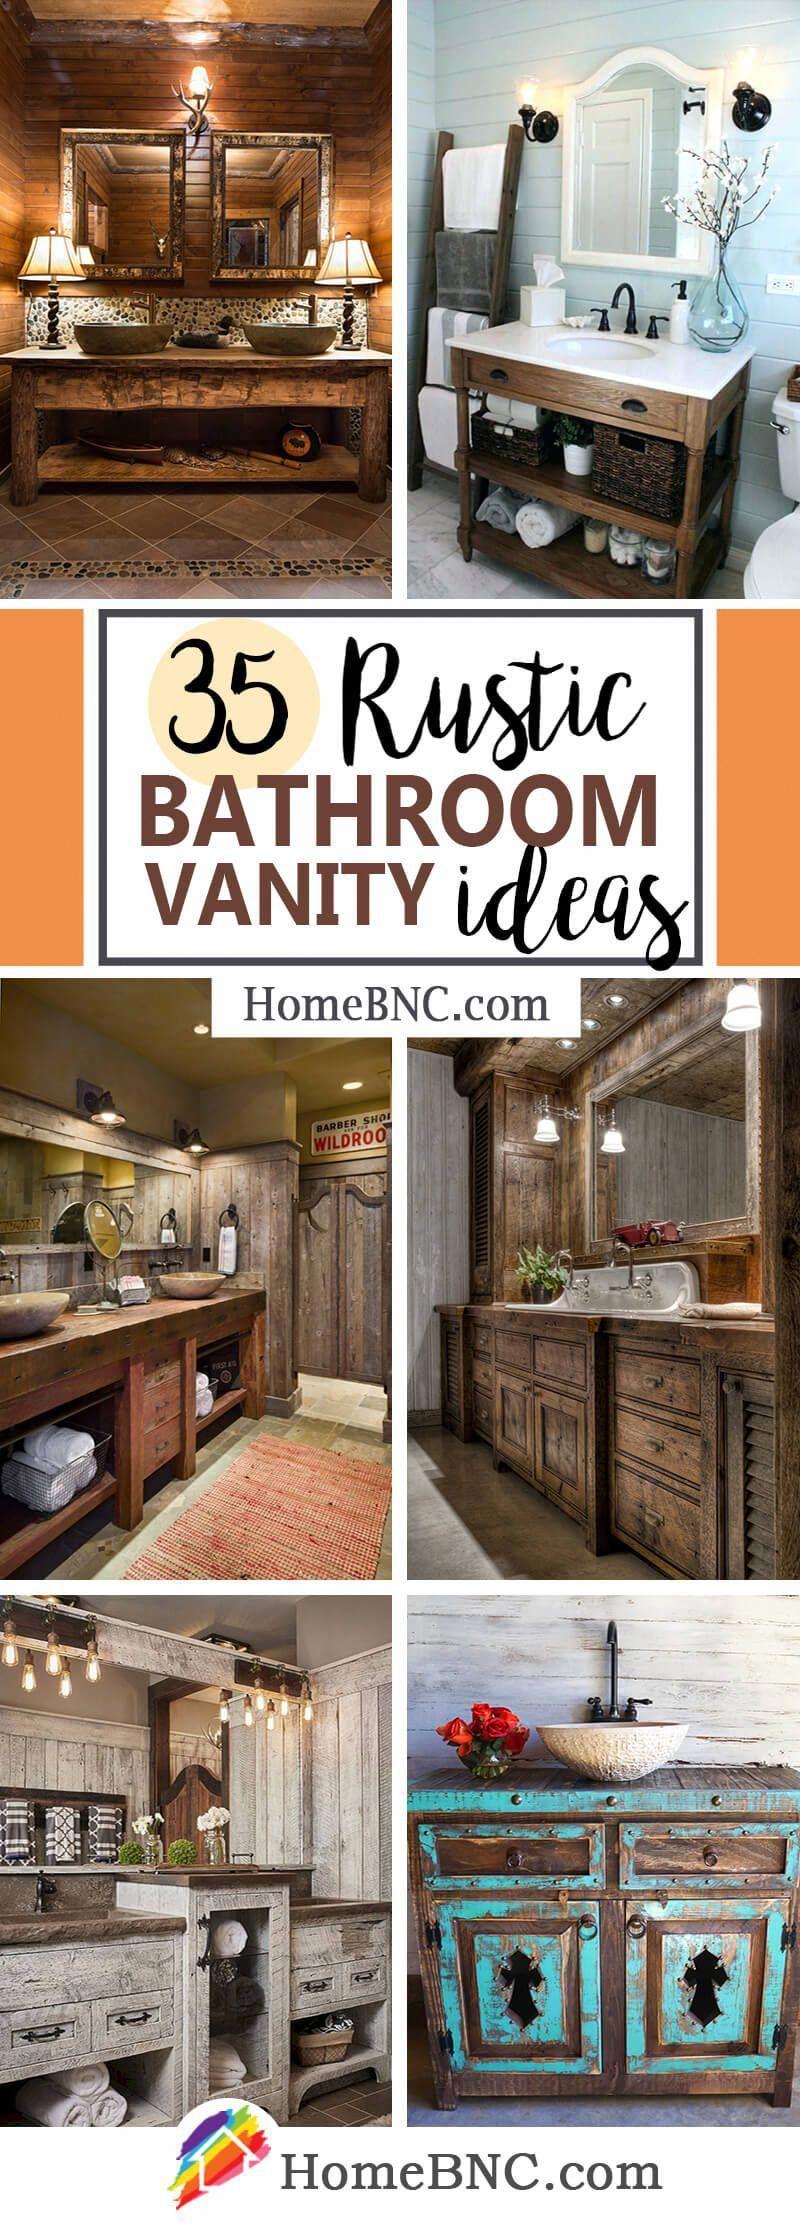 2016 Remarkable Kitchen Bathroom Sink Faucet Anti-splash ...